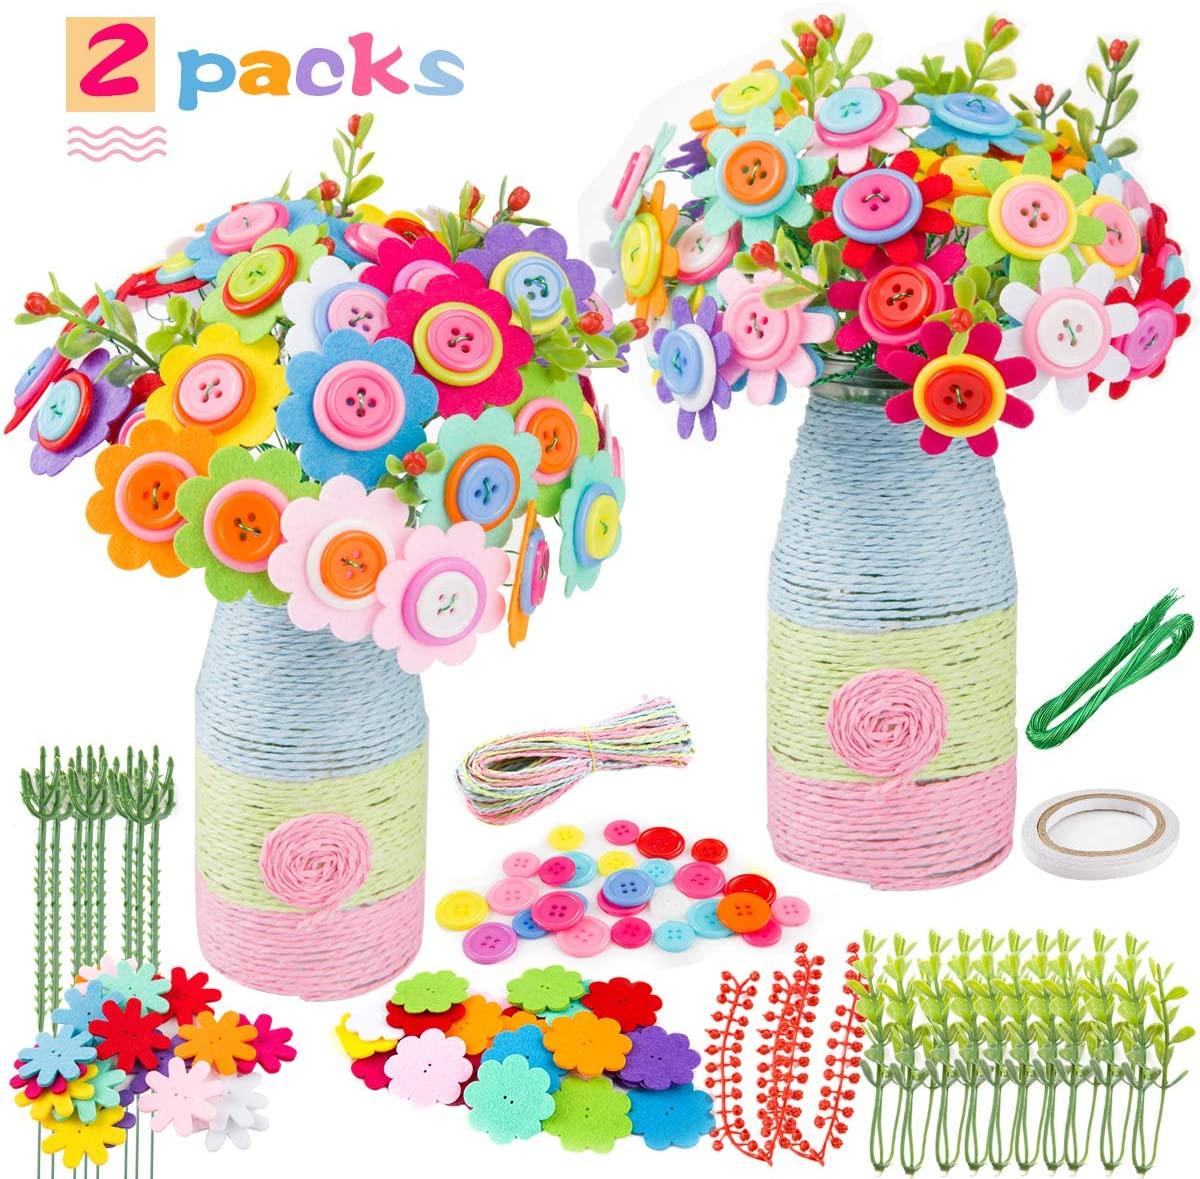 2 Pack DIY Button Flower Crafts Kit- 40pcs Sims Azalea Bouquet Button Gesang Flowers+ 40pcs Sunflower Button Felt Bouquets Kit with Gypsophila Paper Rope Iron Wire Bottles DIY Gift for Kids Children